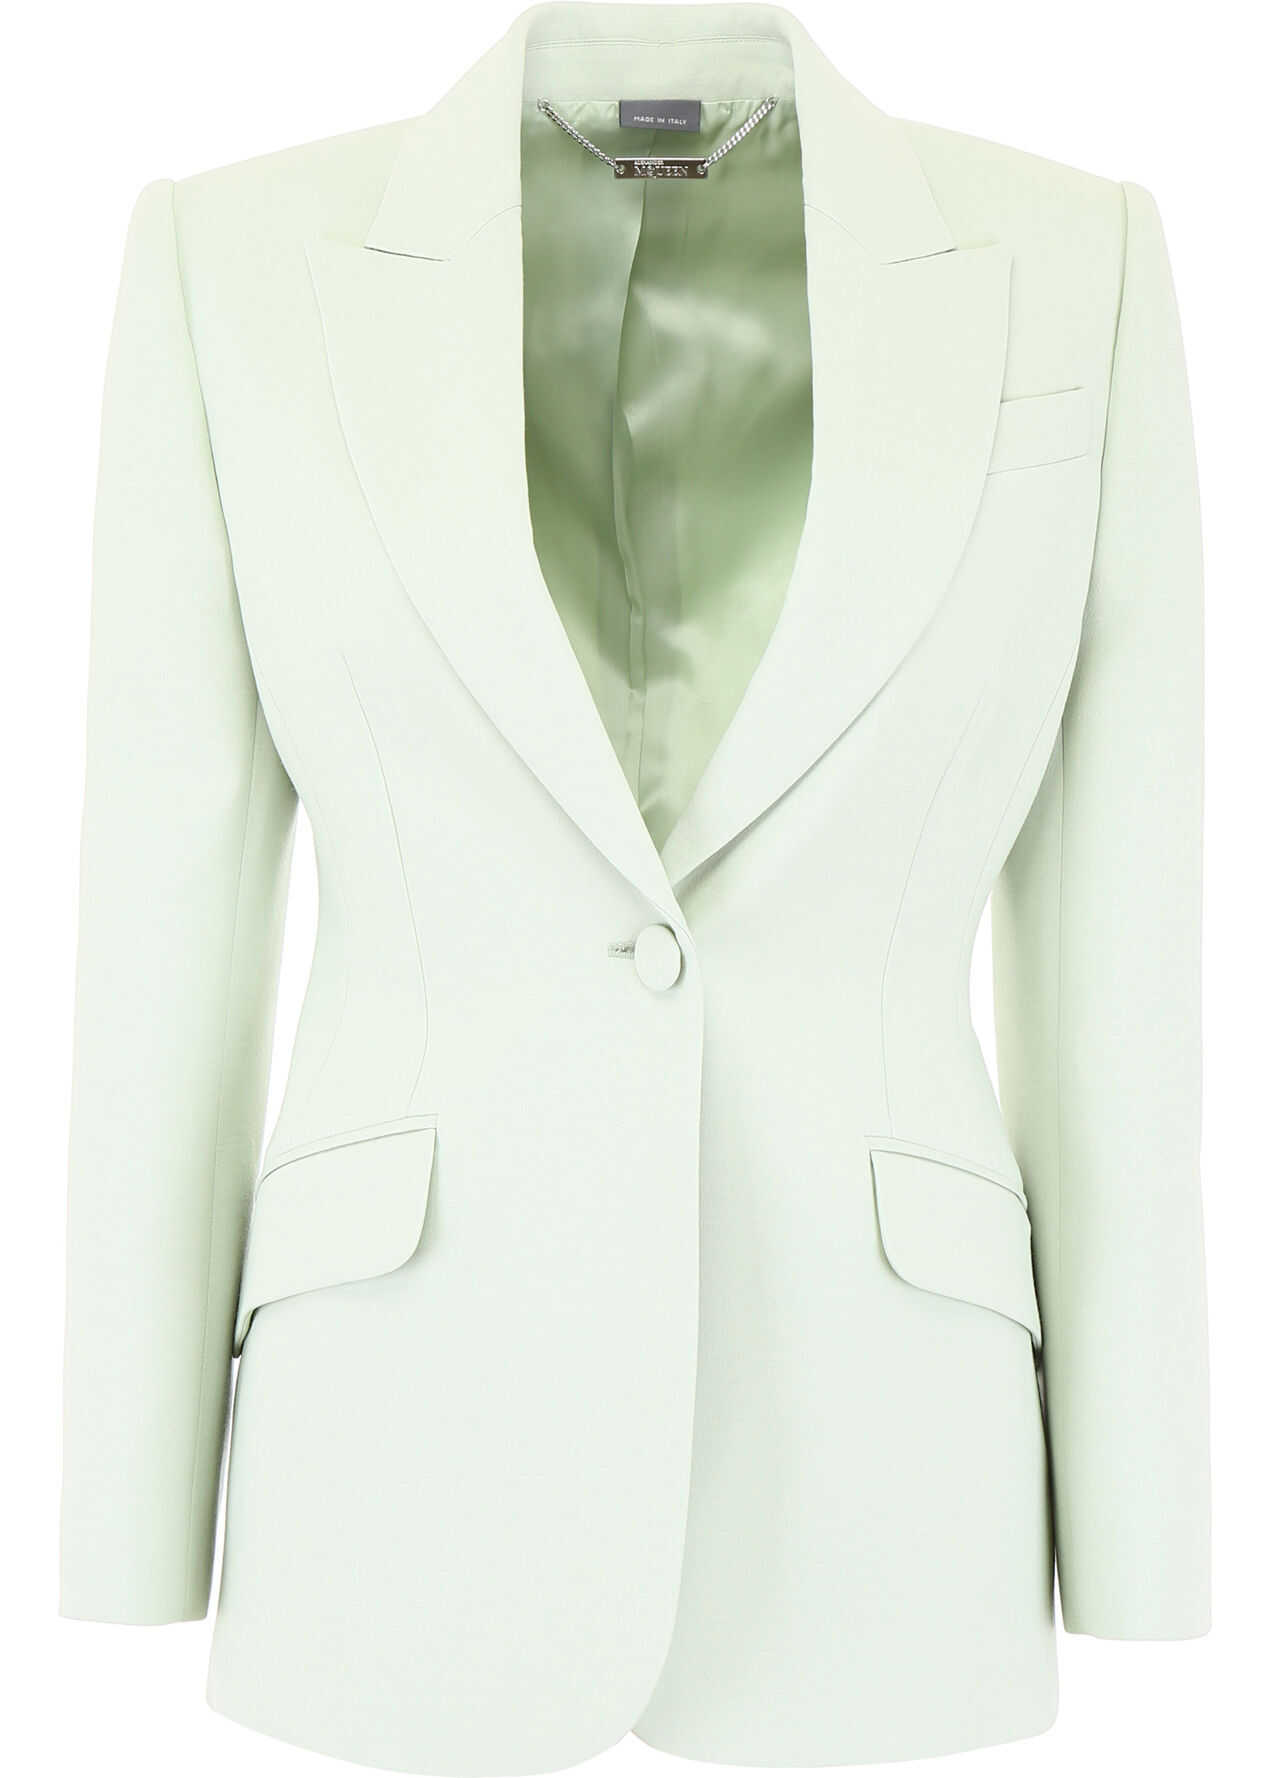 Alexander McQueen Single-Breasted Jacket MINT